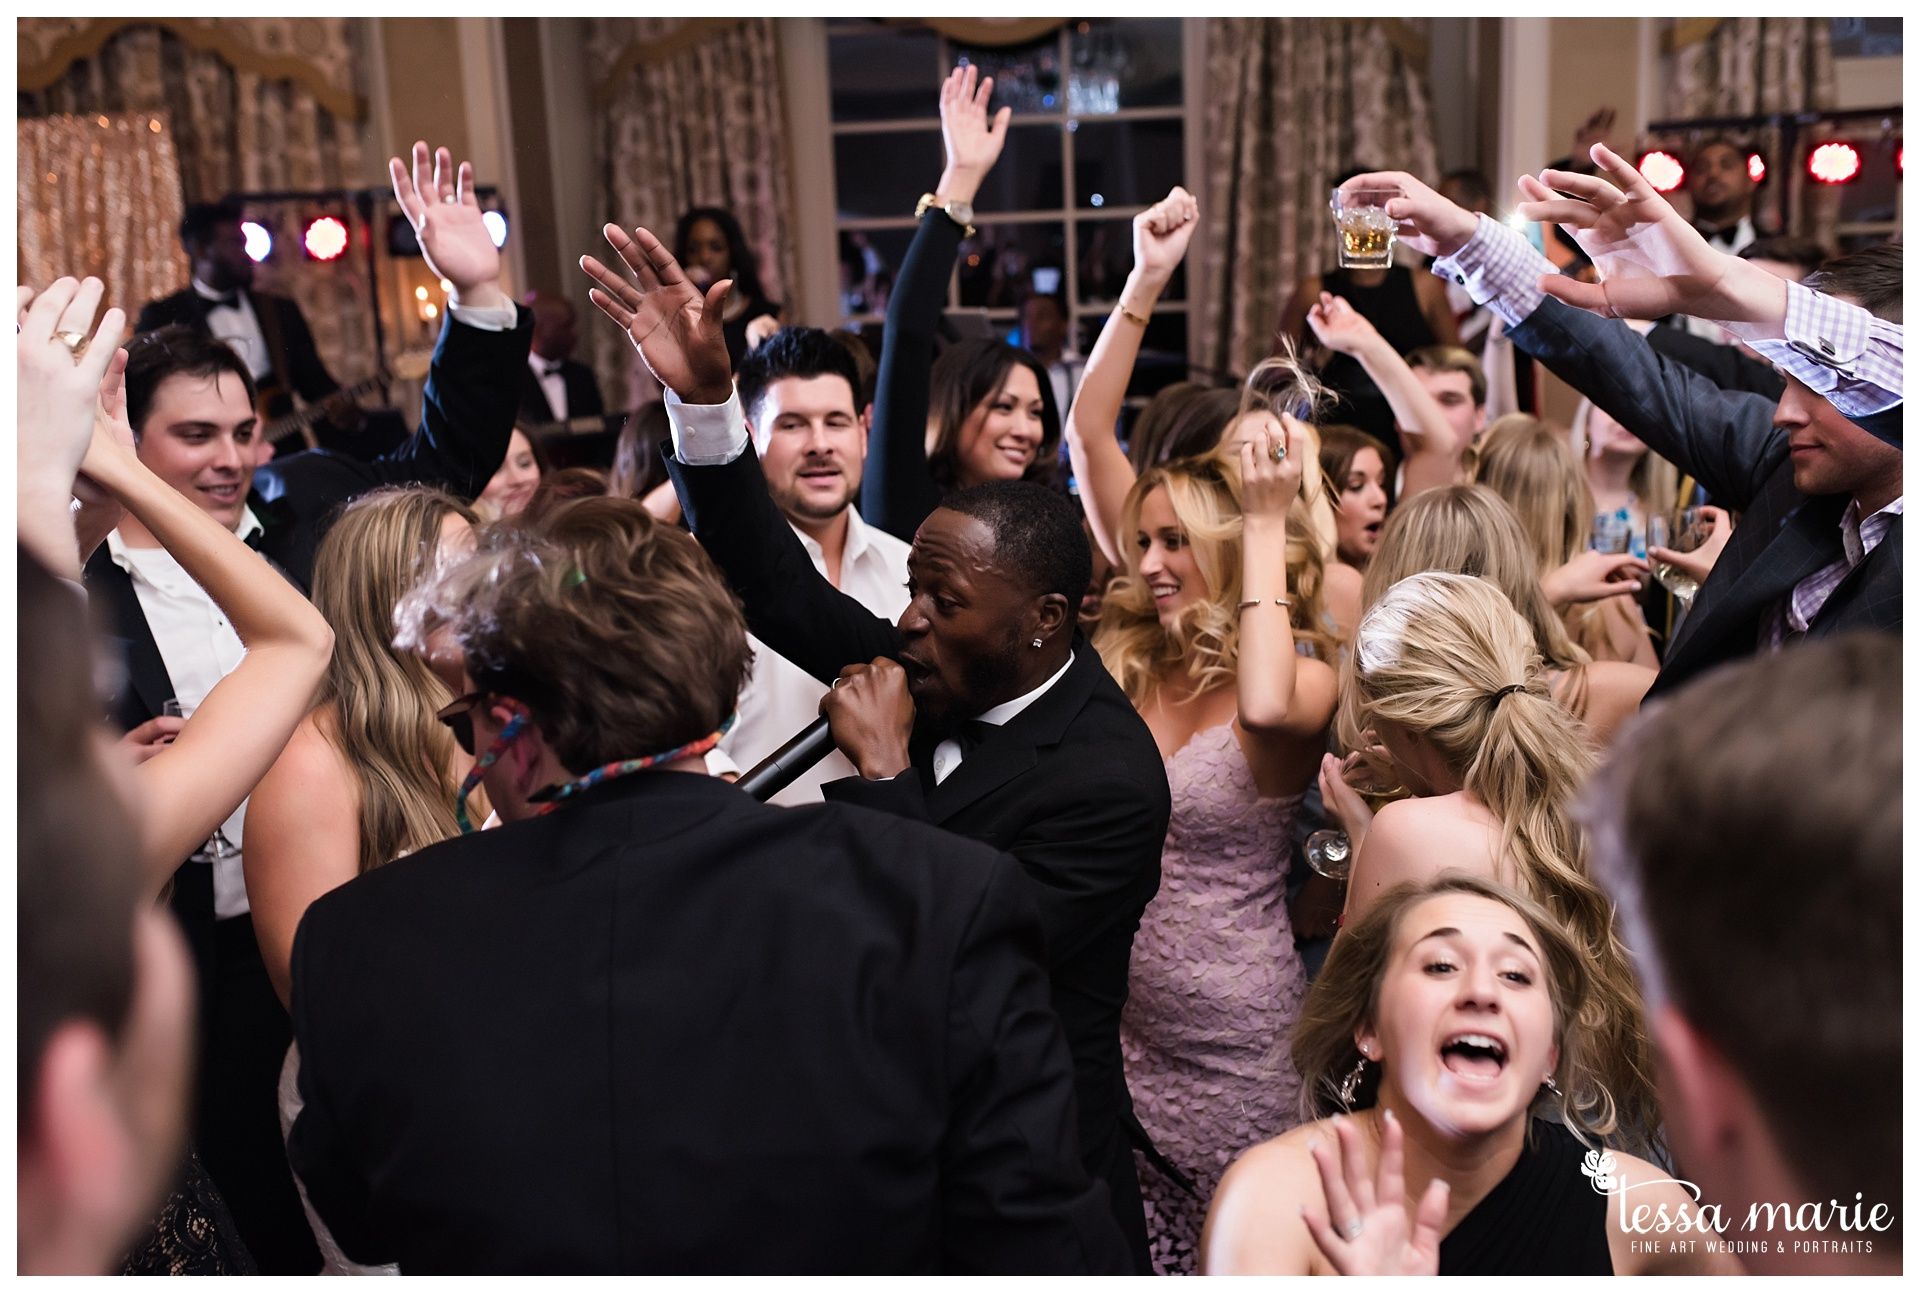 tessa_marie_weddings_legacy_story_focused_wedding_pictures_atlanta_wedding_photographer_0162